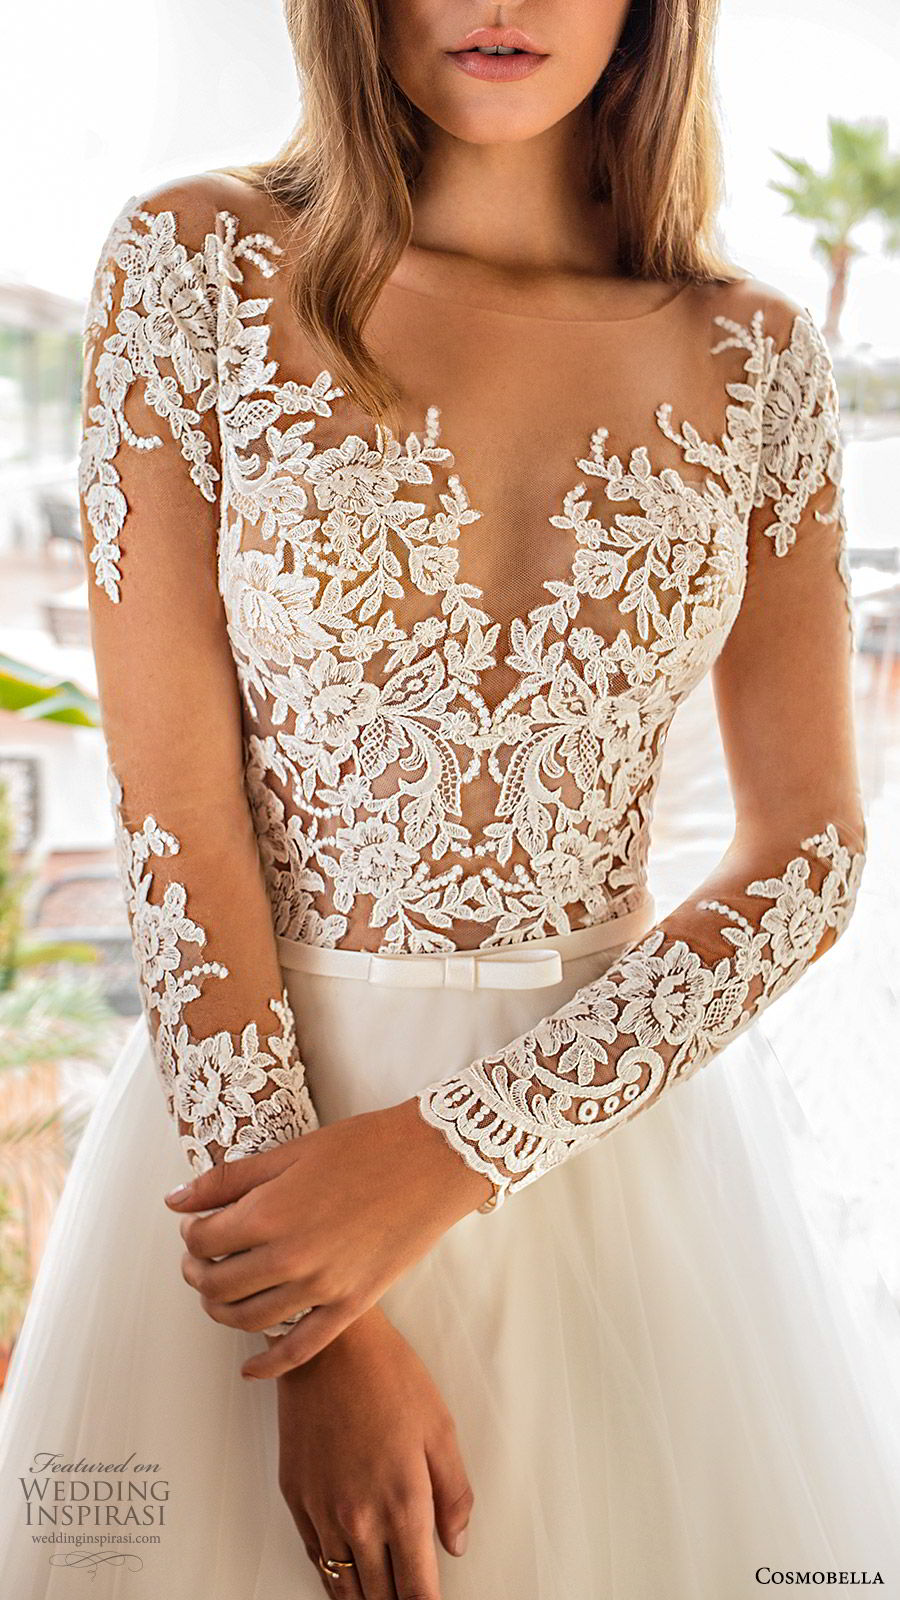 cosmobella 2020 bridal illusion long sleeves sheer bateau sweetheart lace bodice a line ball gown wedding dress (1) ivory romantic princess chapel train zv